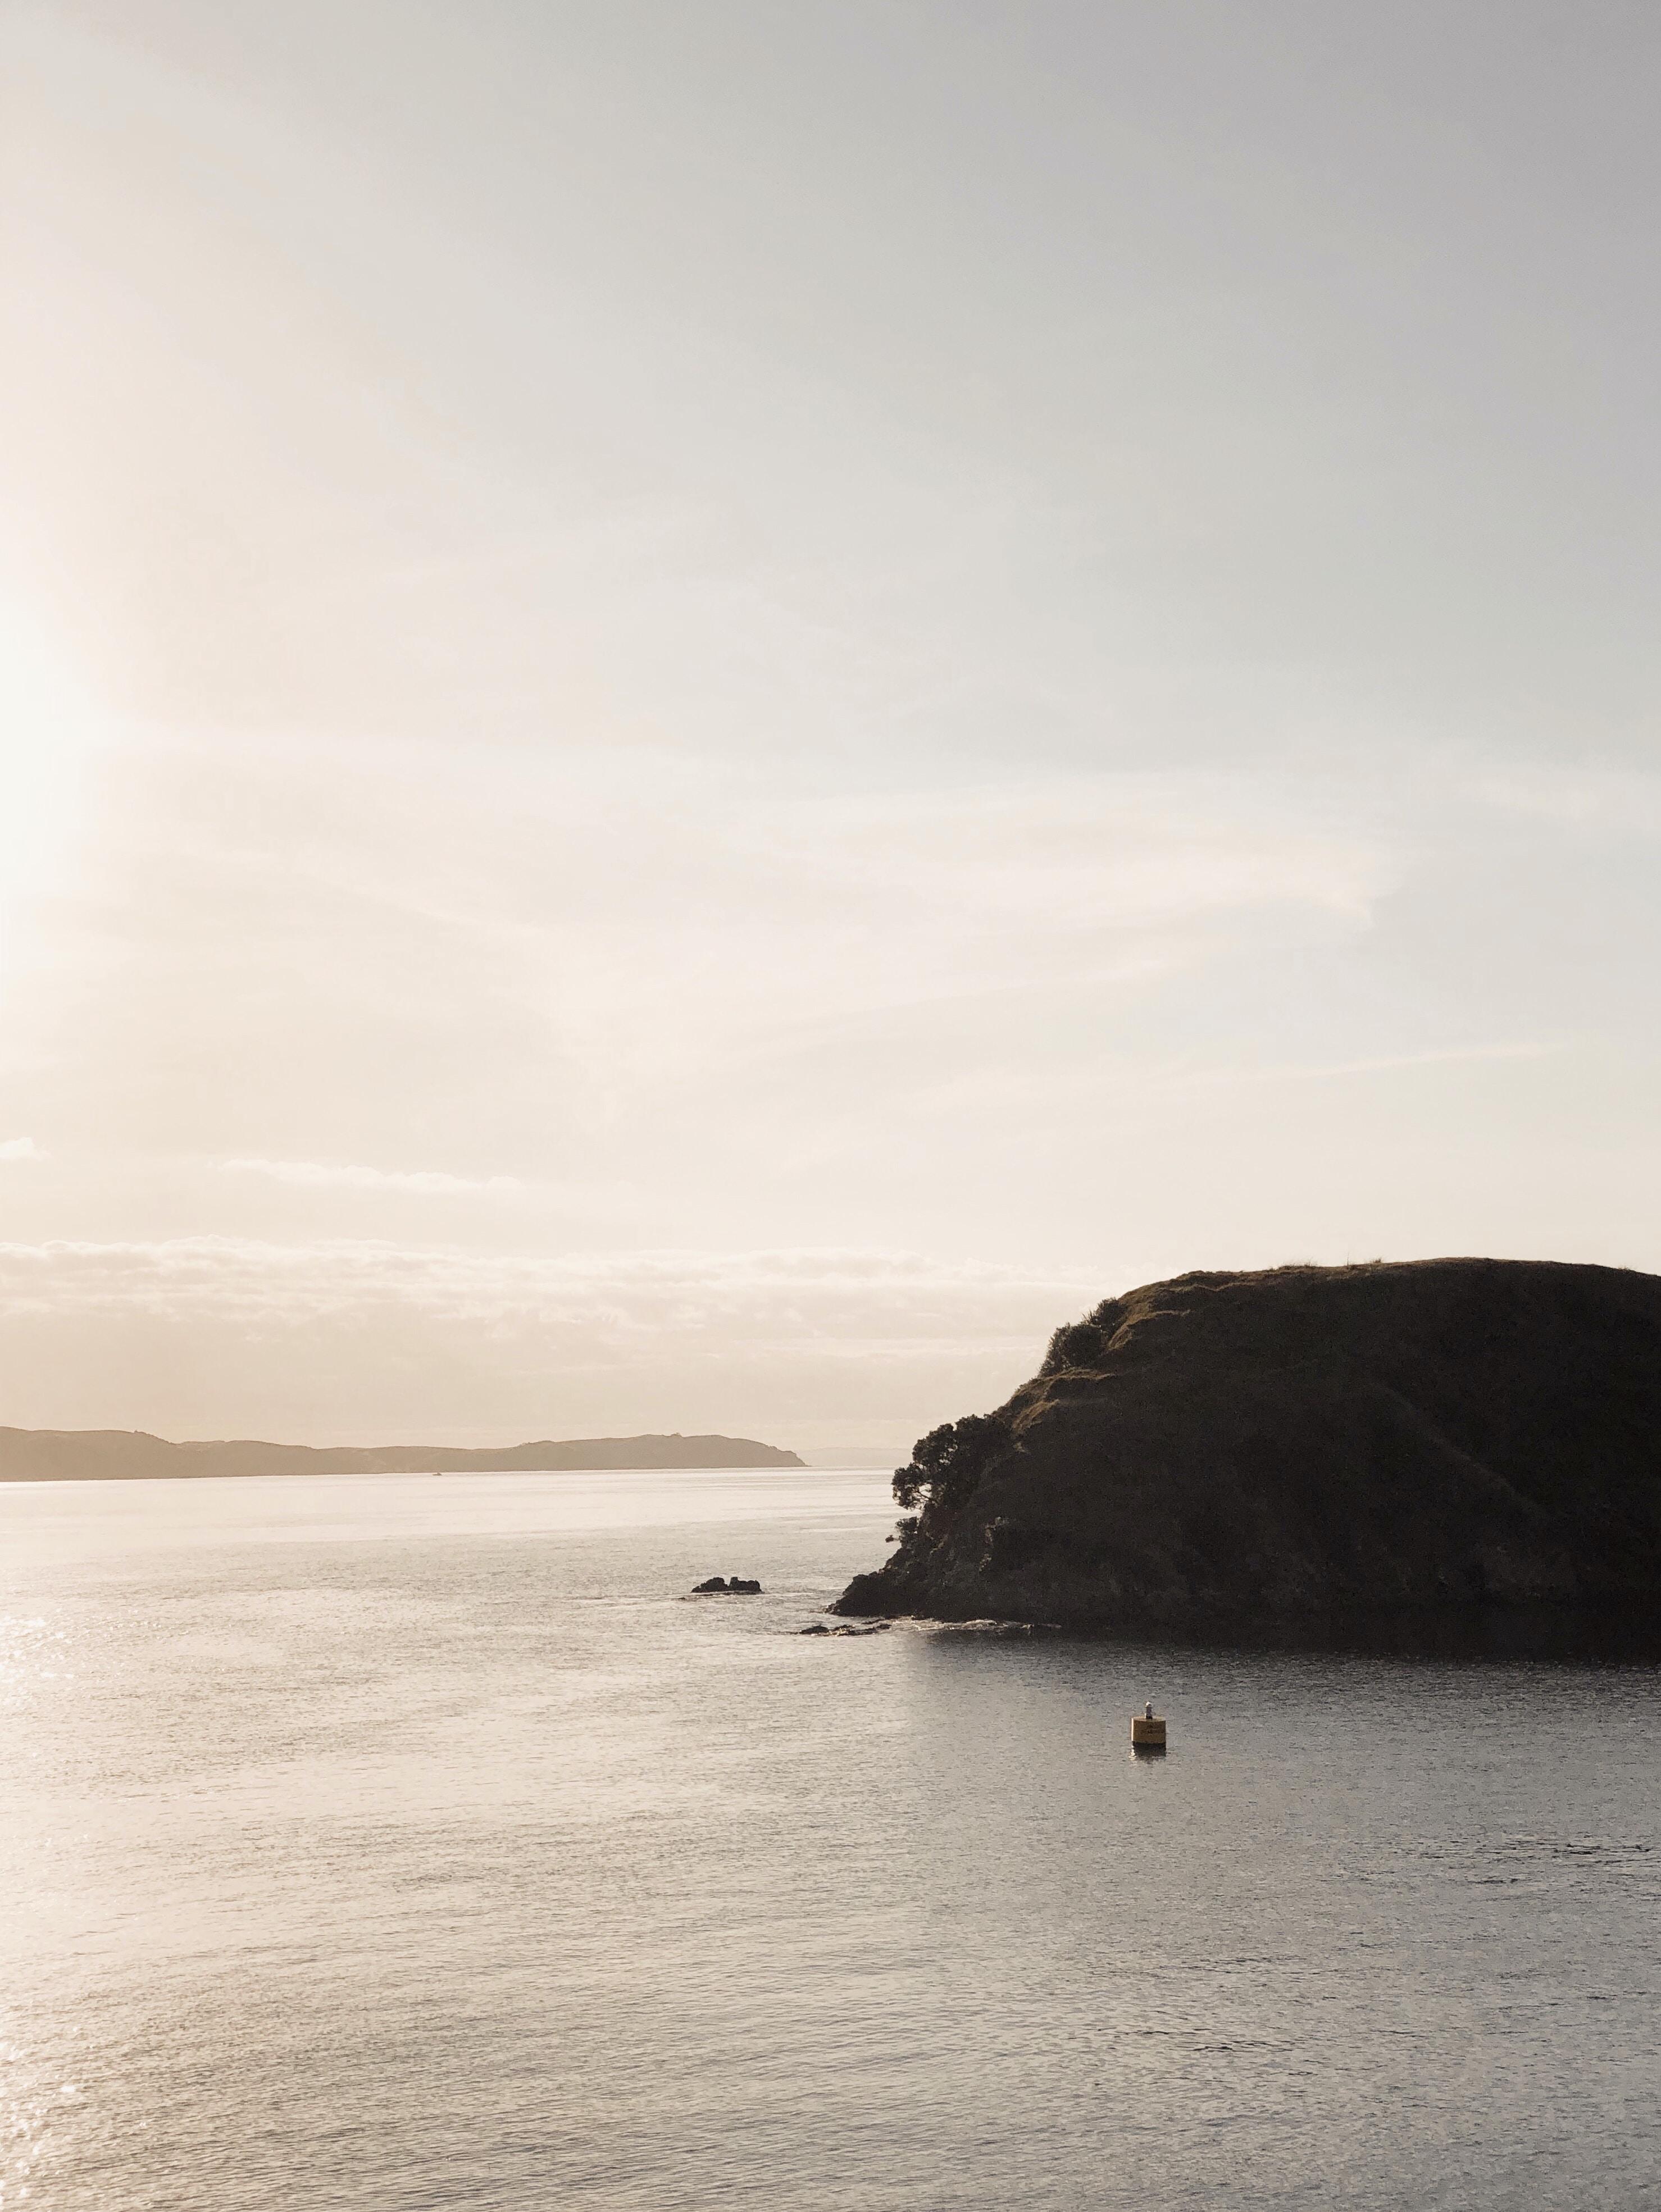 boat sailing near rock of ocean